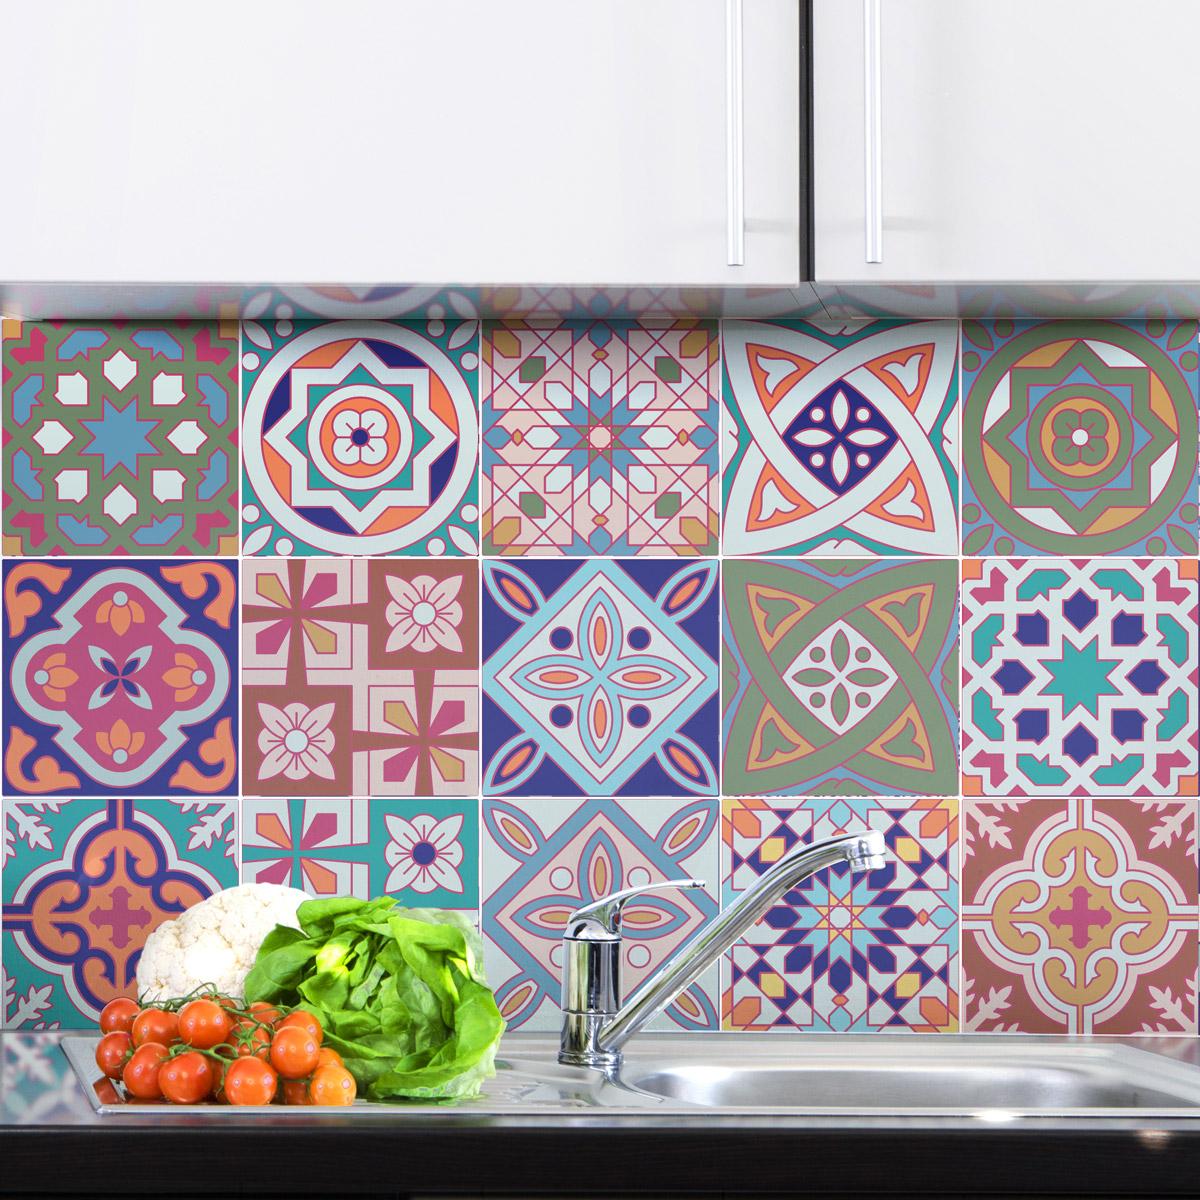 15 stickers carrelages azulejos venise art et design. Black Bedroom Furniture Sets. Home Design Ideas